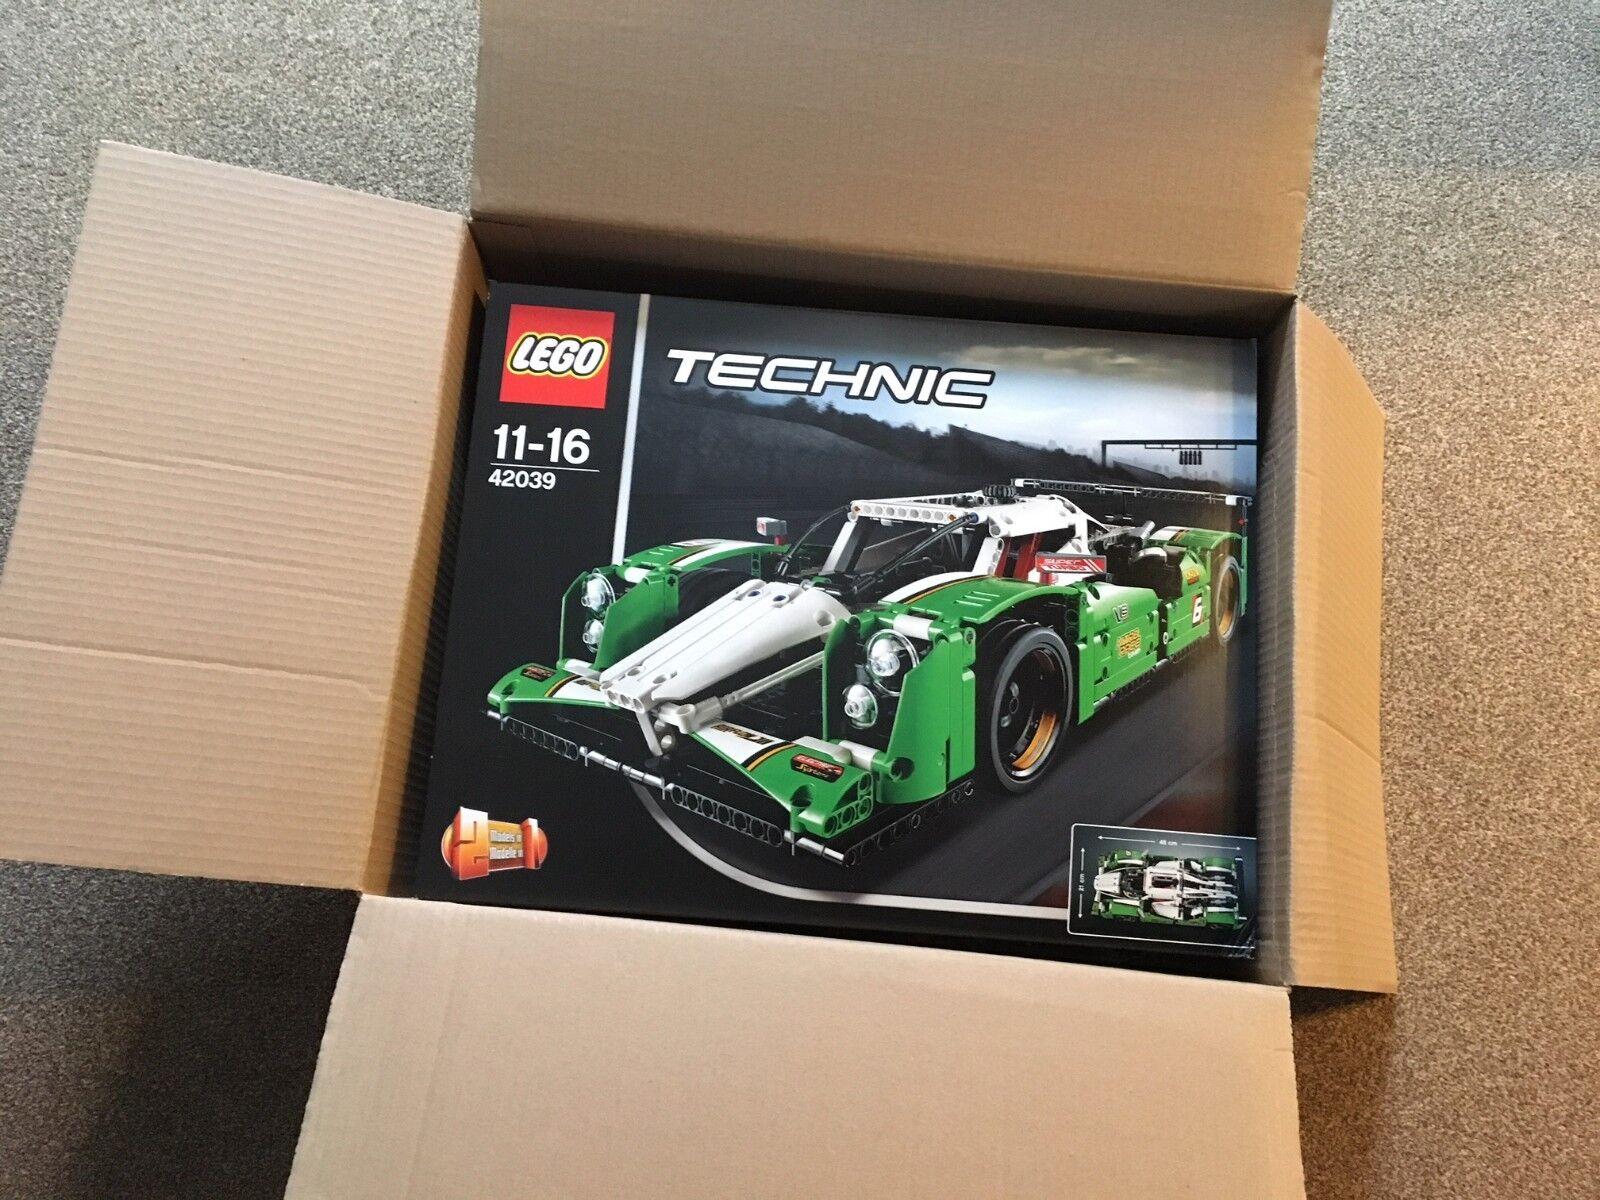 LEGO Technik 42039 Rennwagen NEU+OVP  MISB